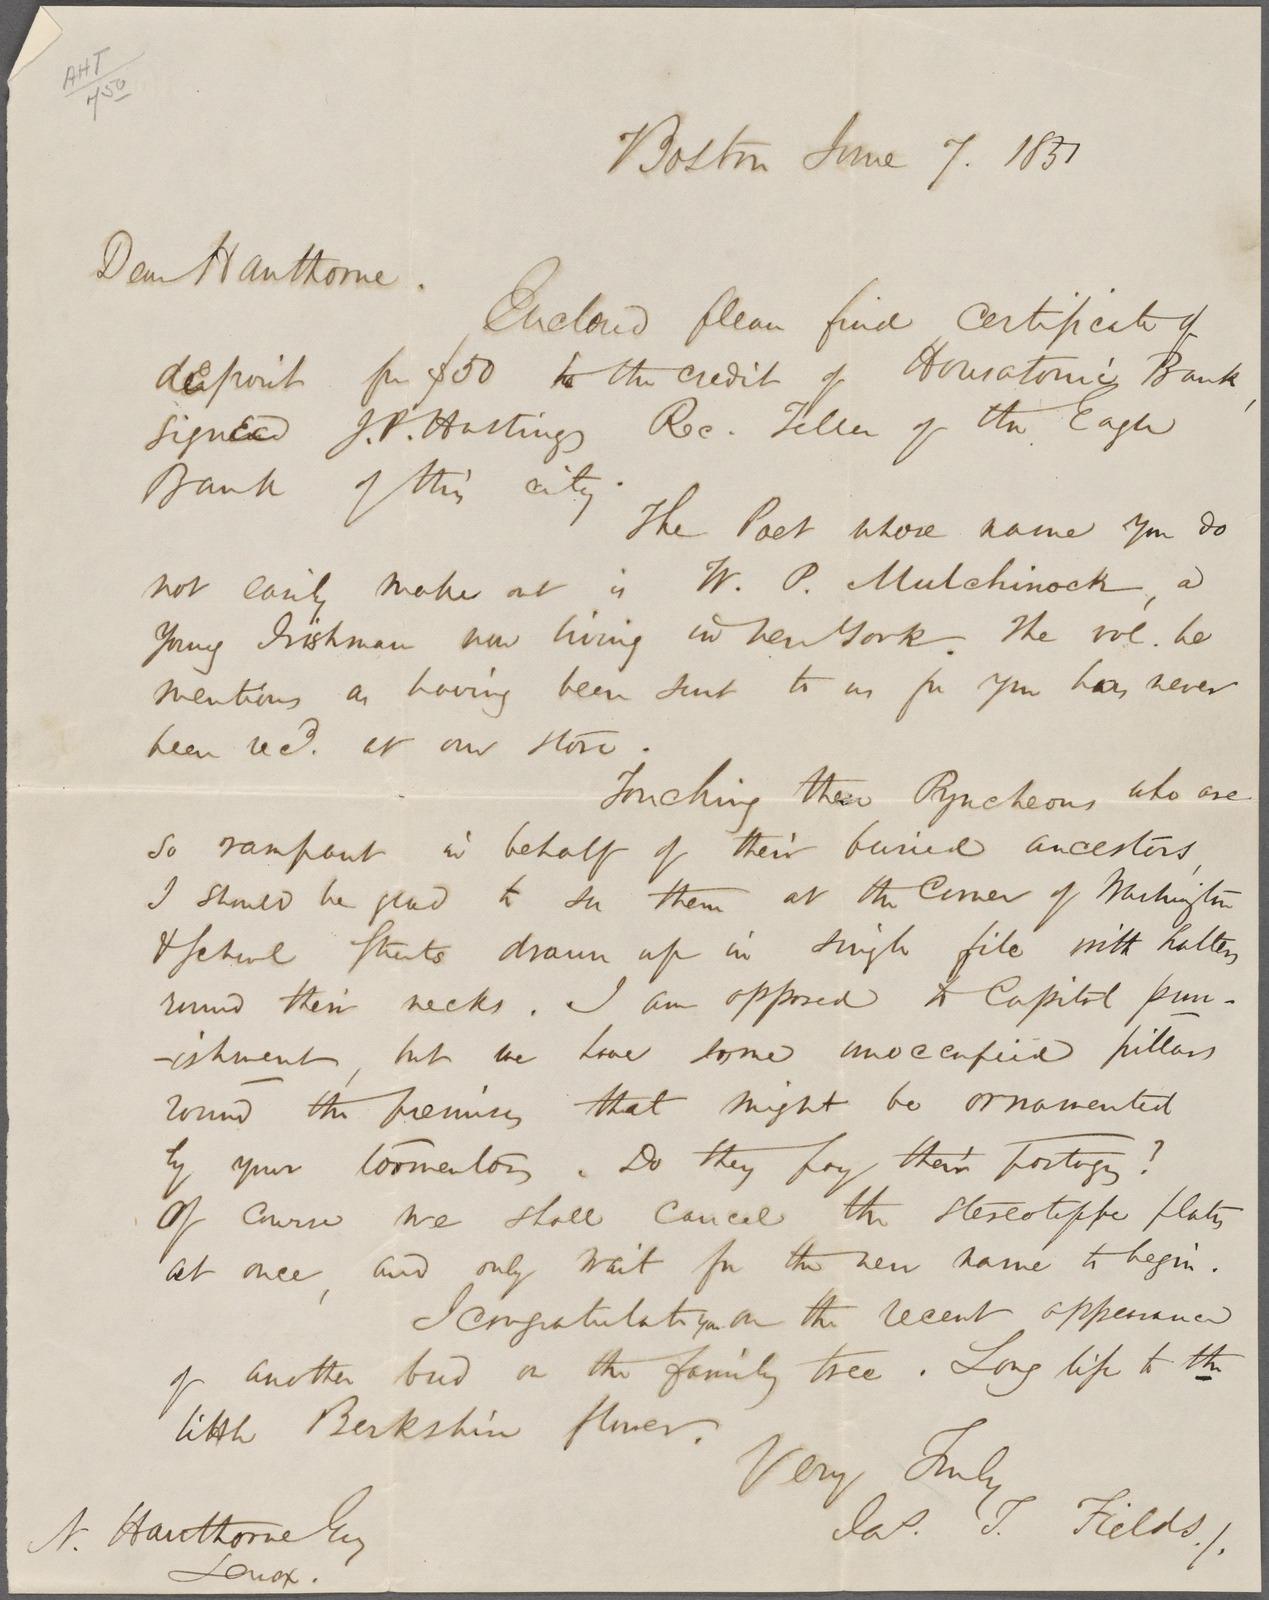 Fields, J. T., ALS, to NH. Jun. 7, 1851.